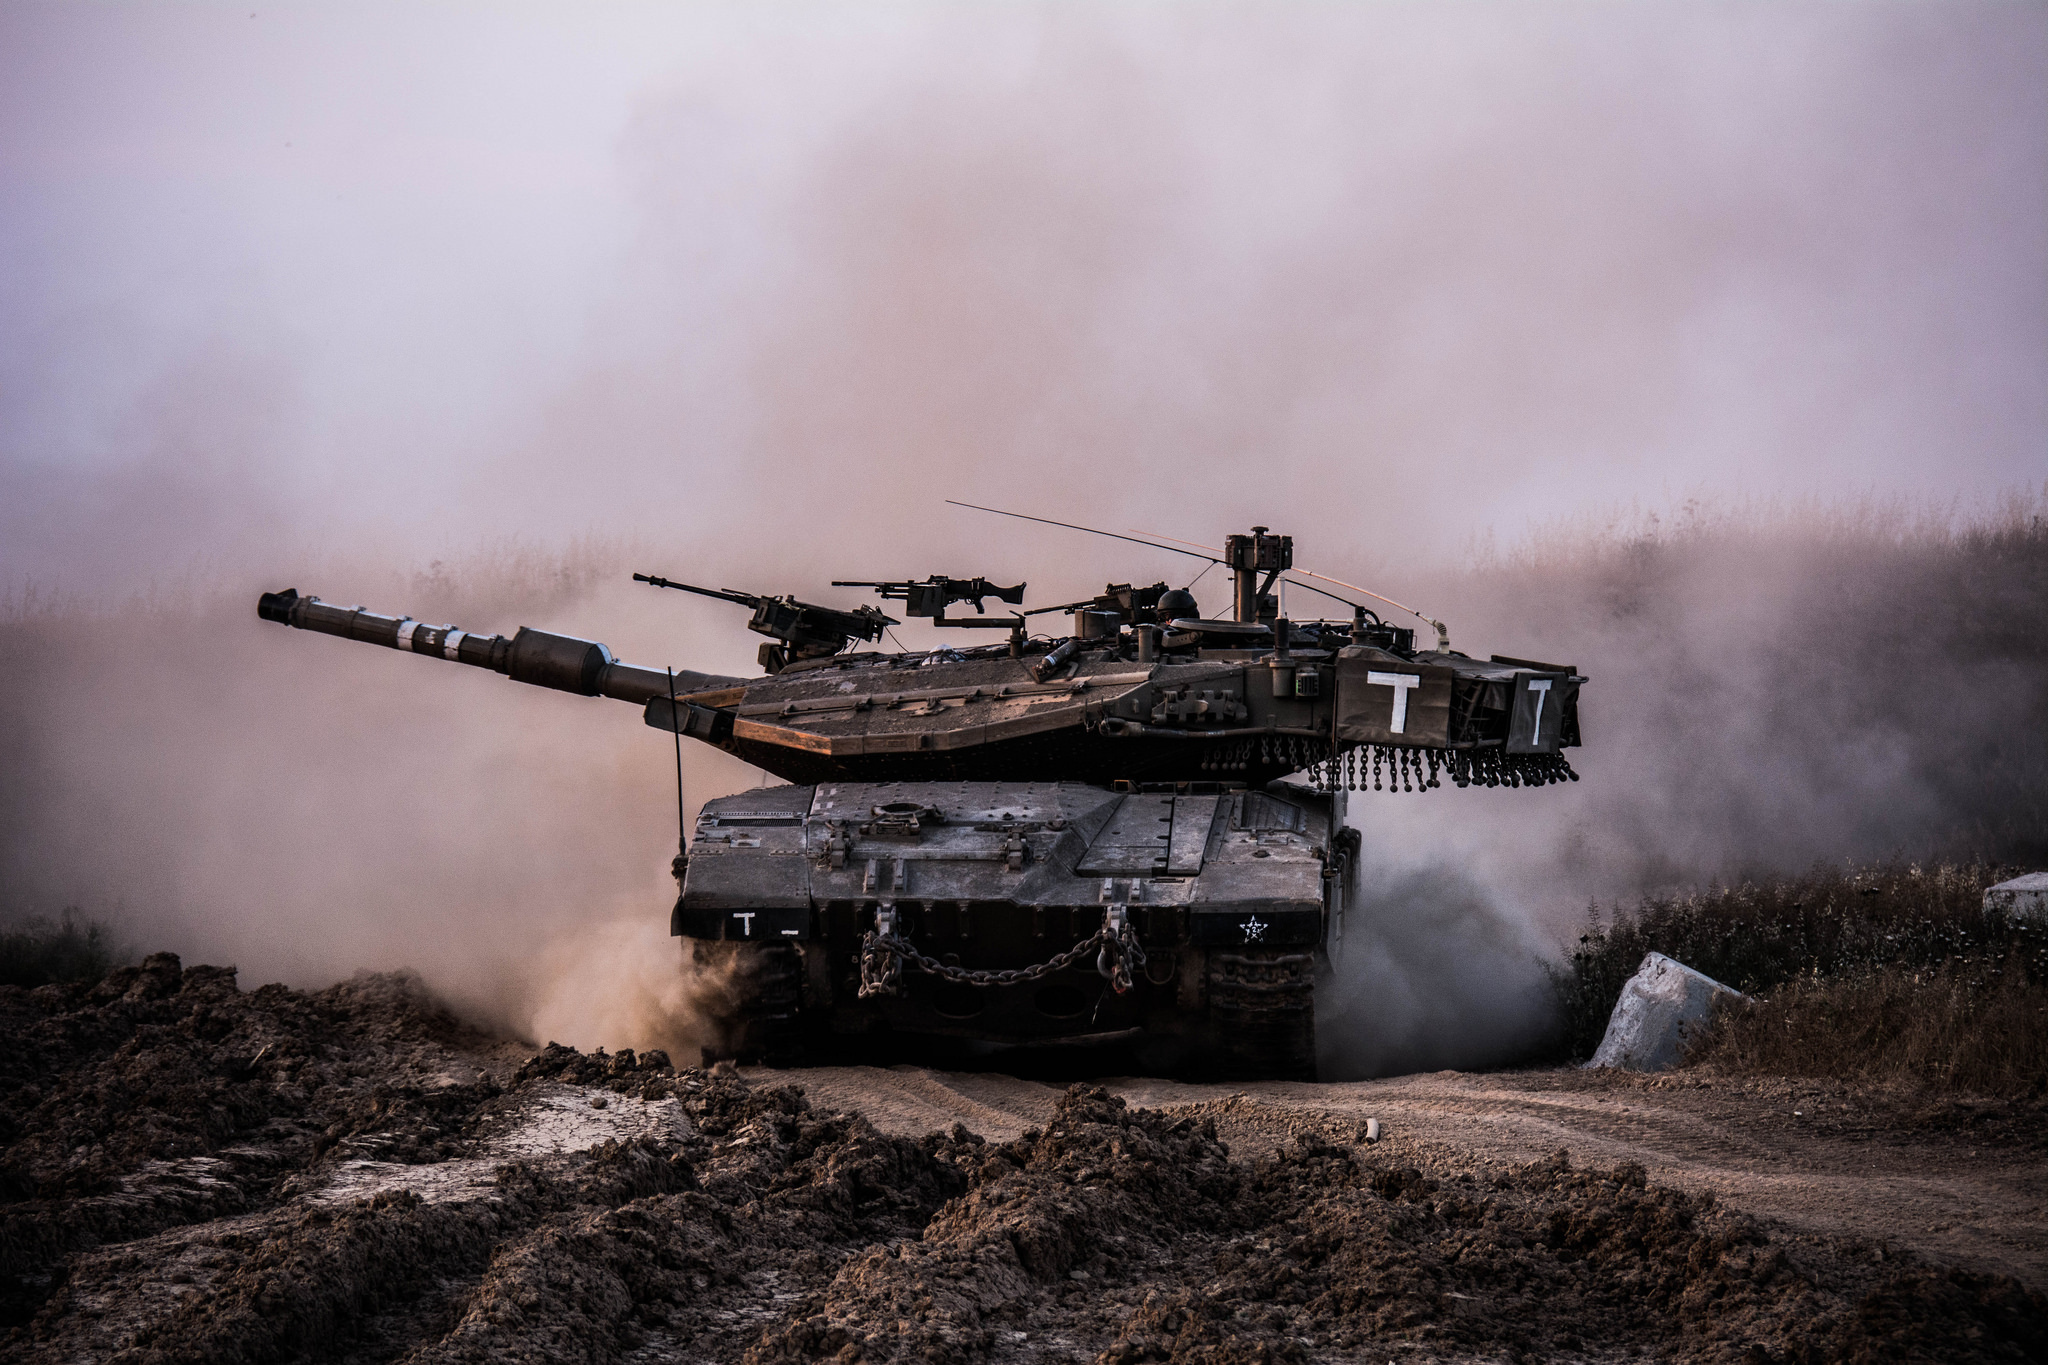 Israeli tank Merkava-4: characteristics, photo 95